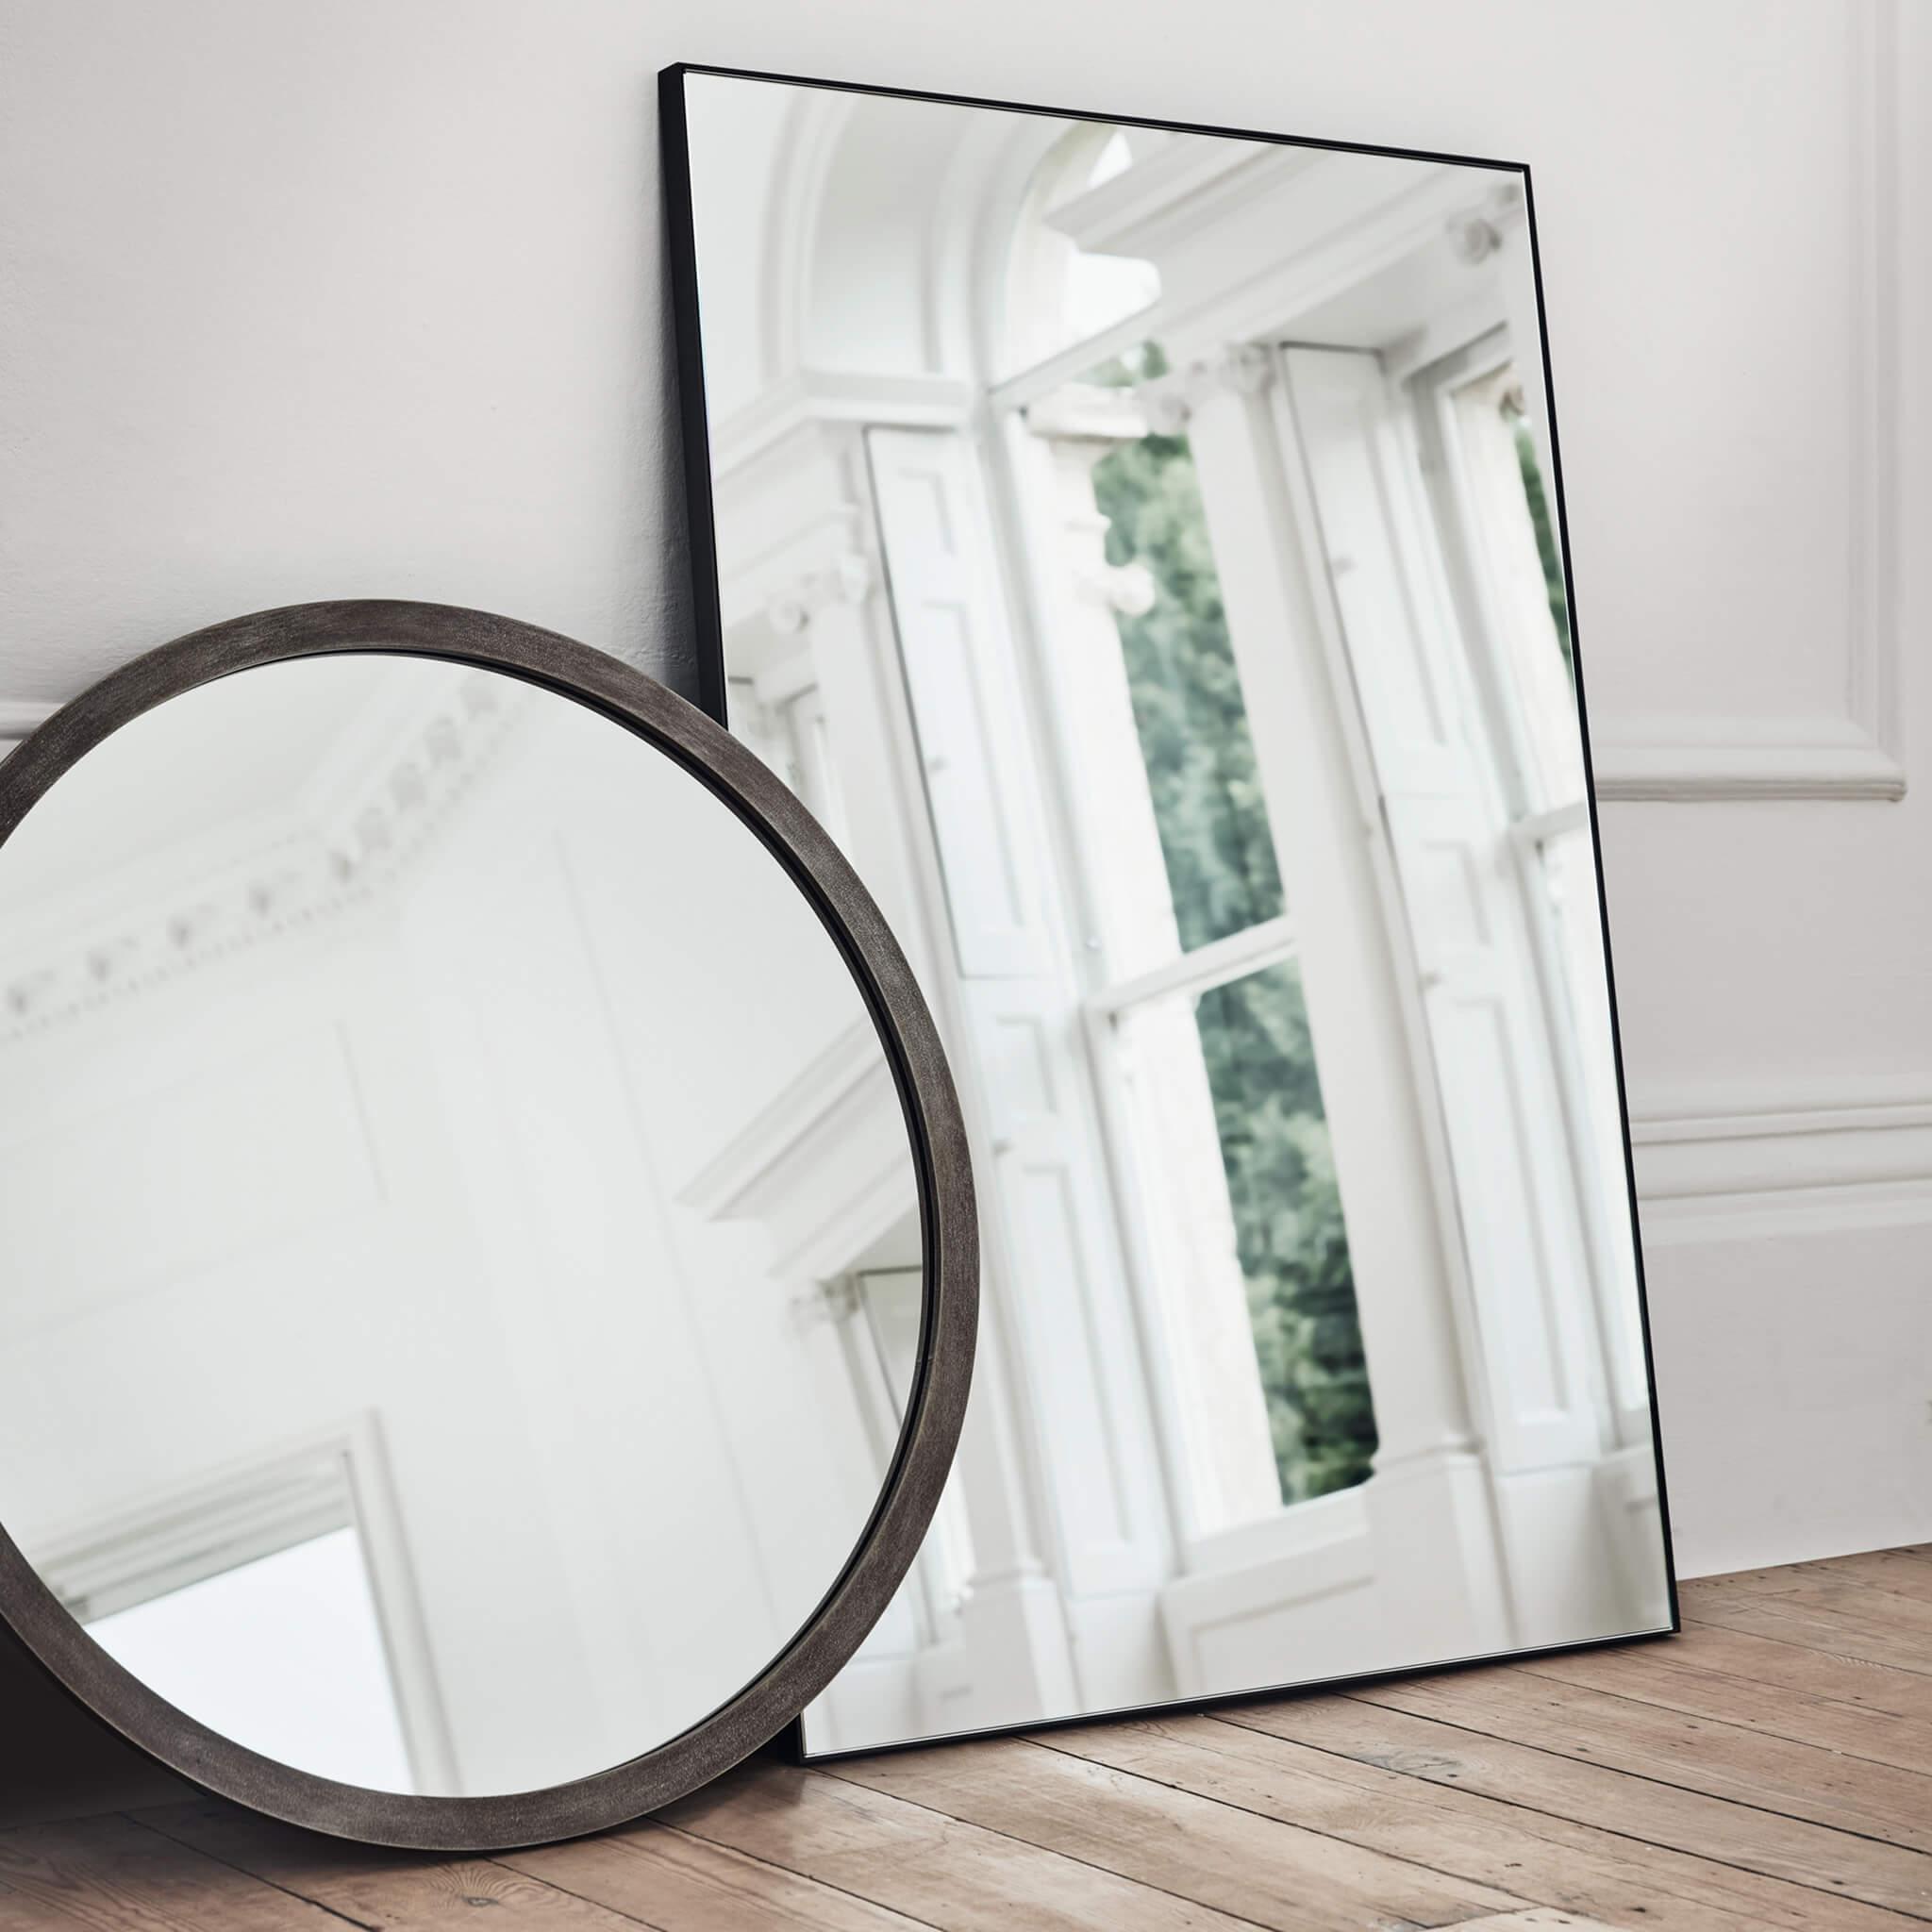 Round and Rectangular Mirrors | modern furniture by Tom Faulkner